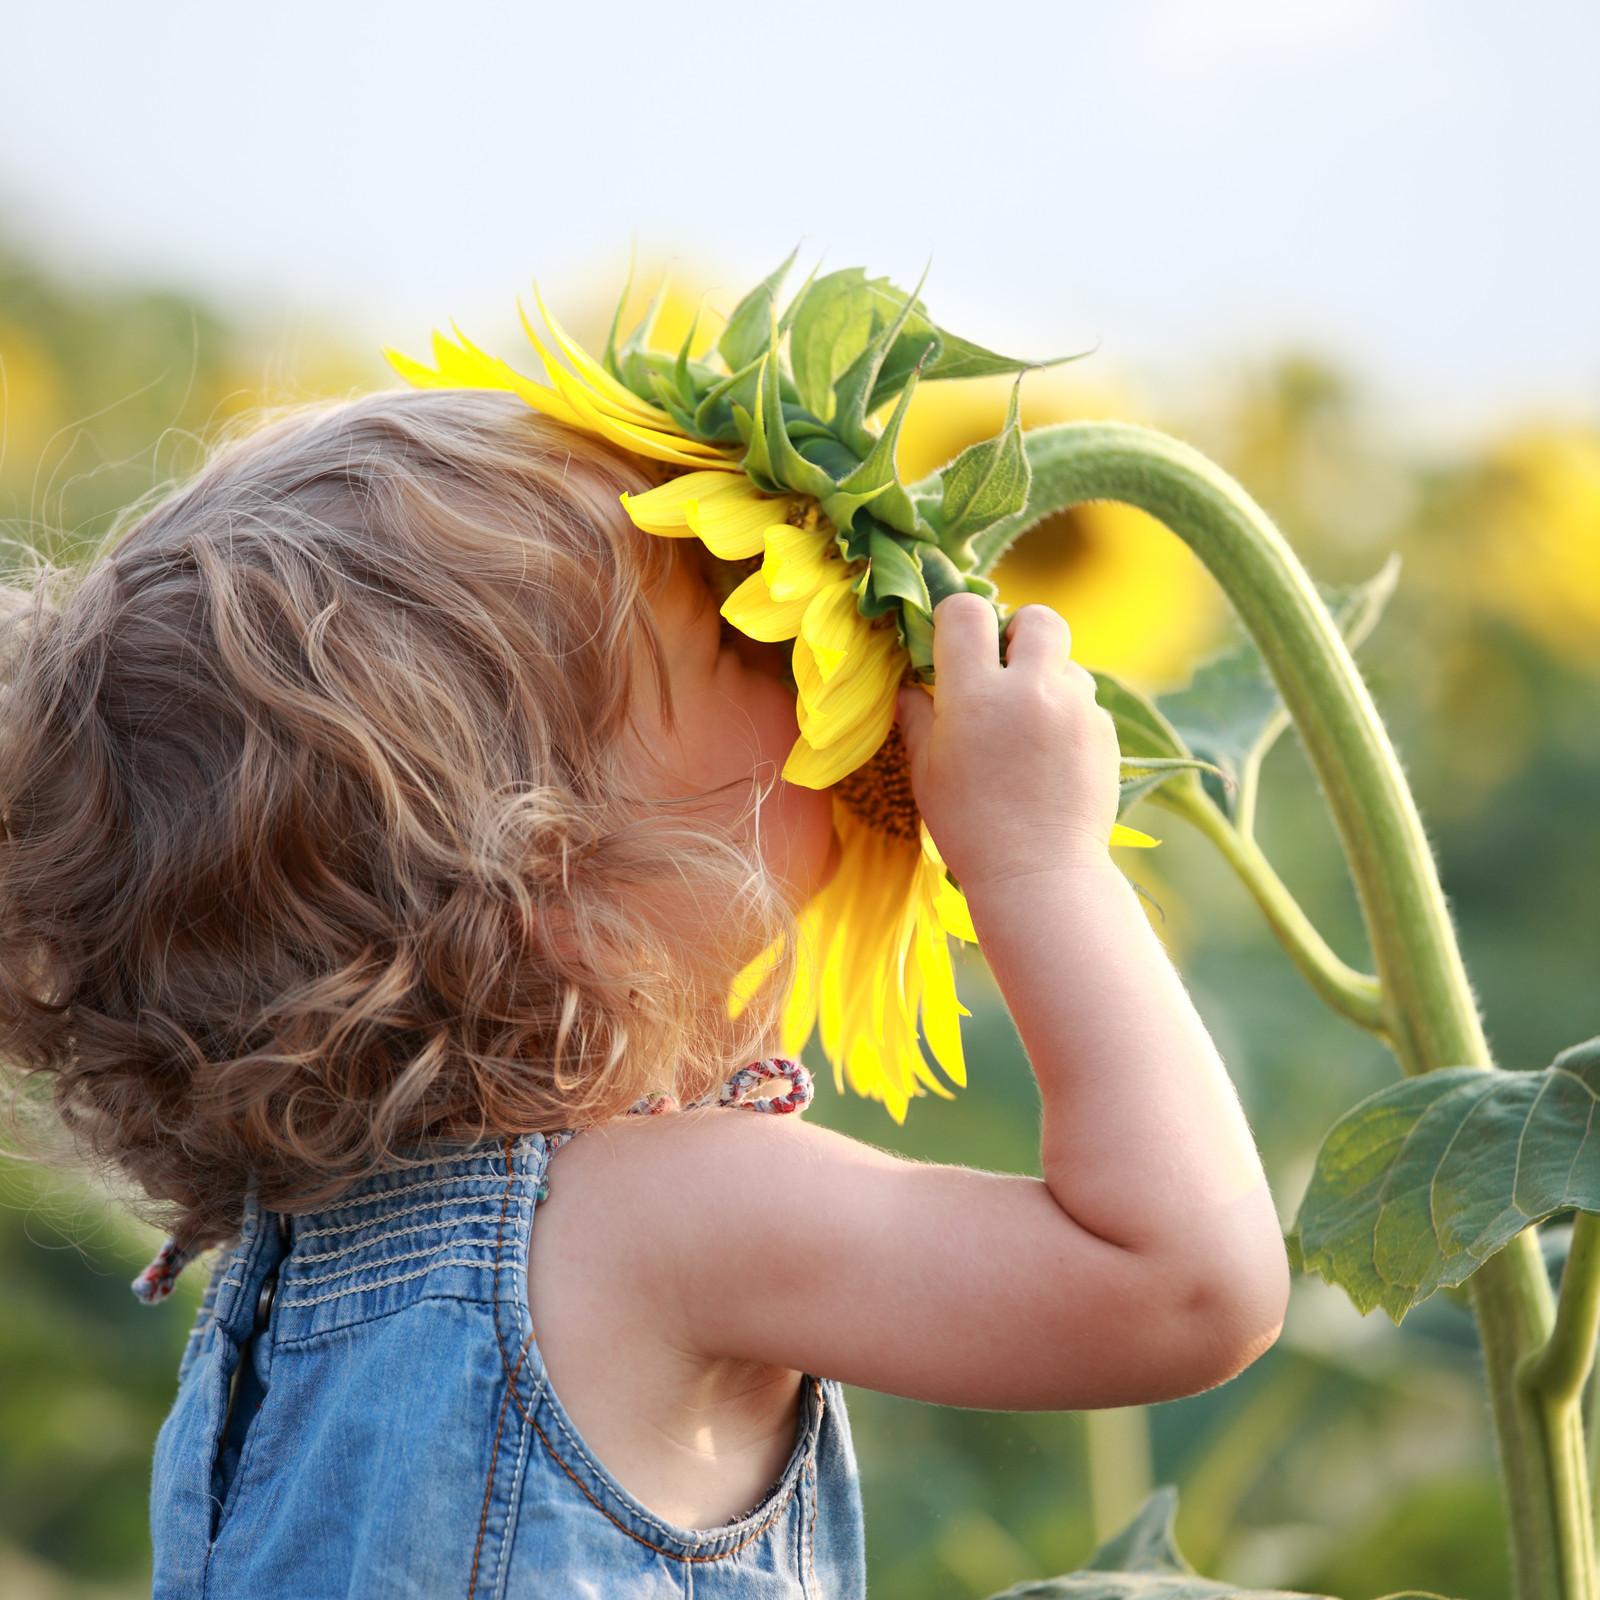 Child embracing sunshine